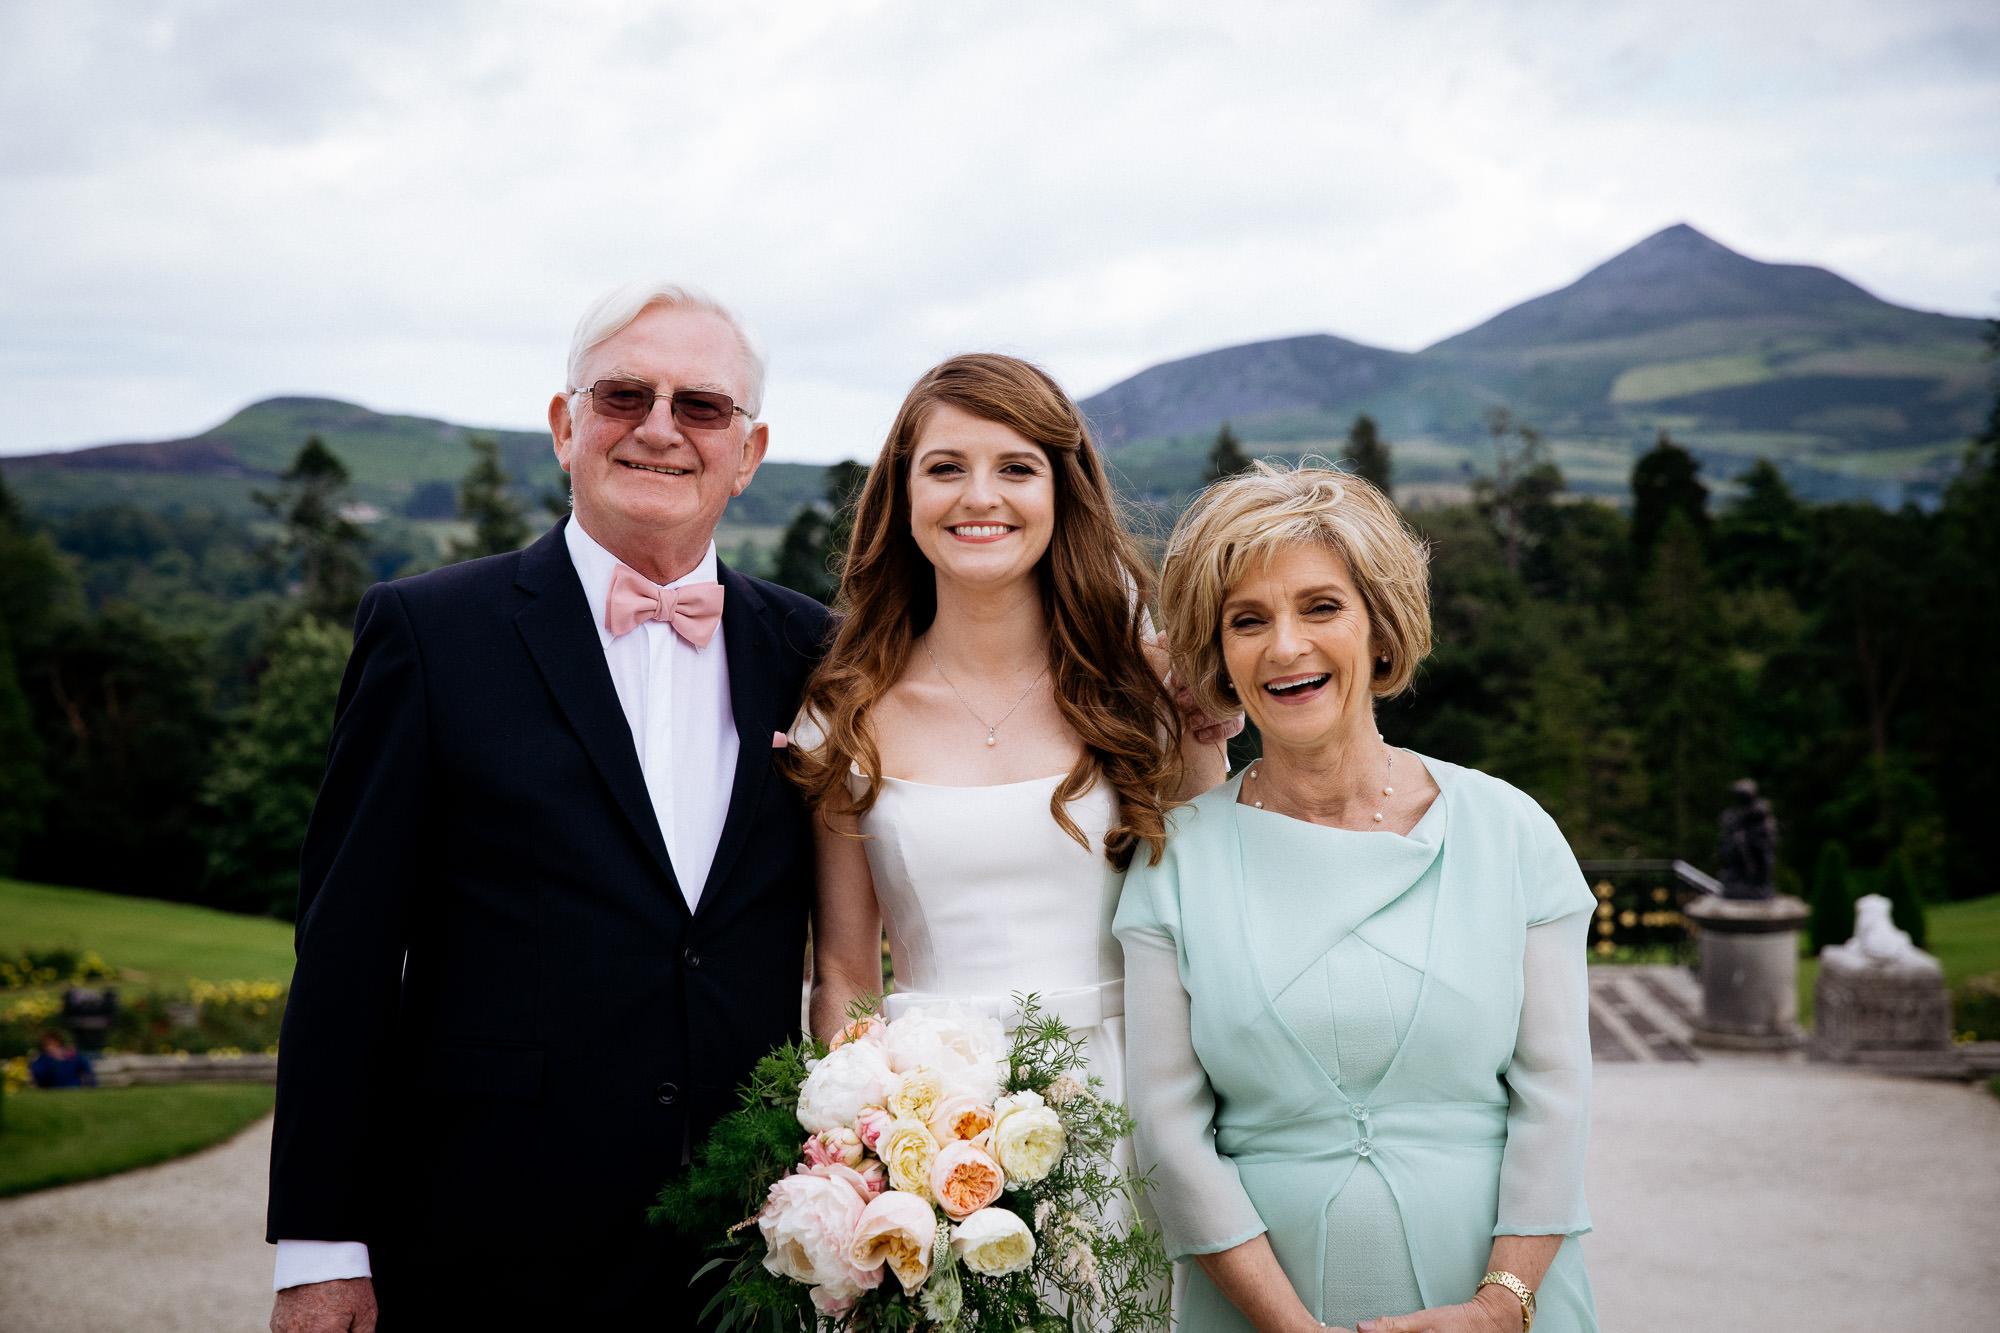 clairebyrnephotography-wedding-Emma-Max-4.jpg